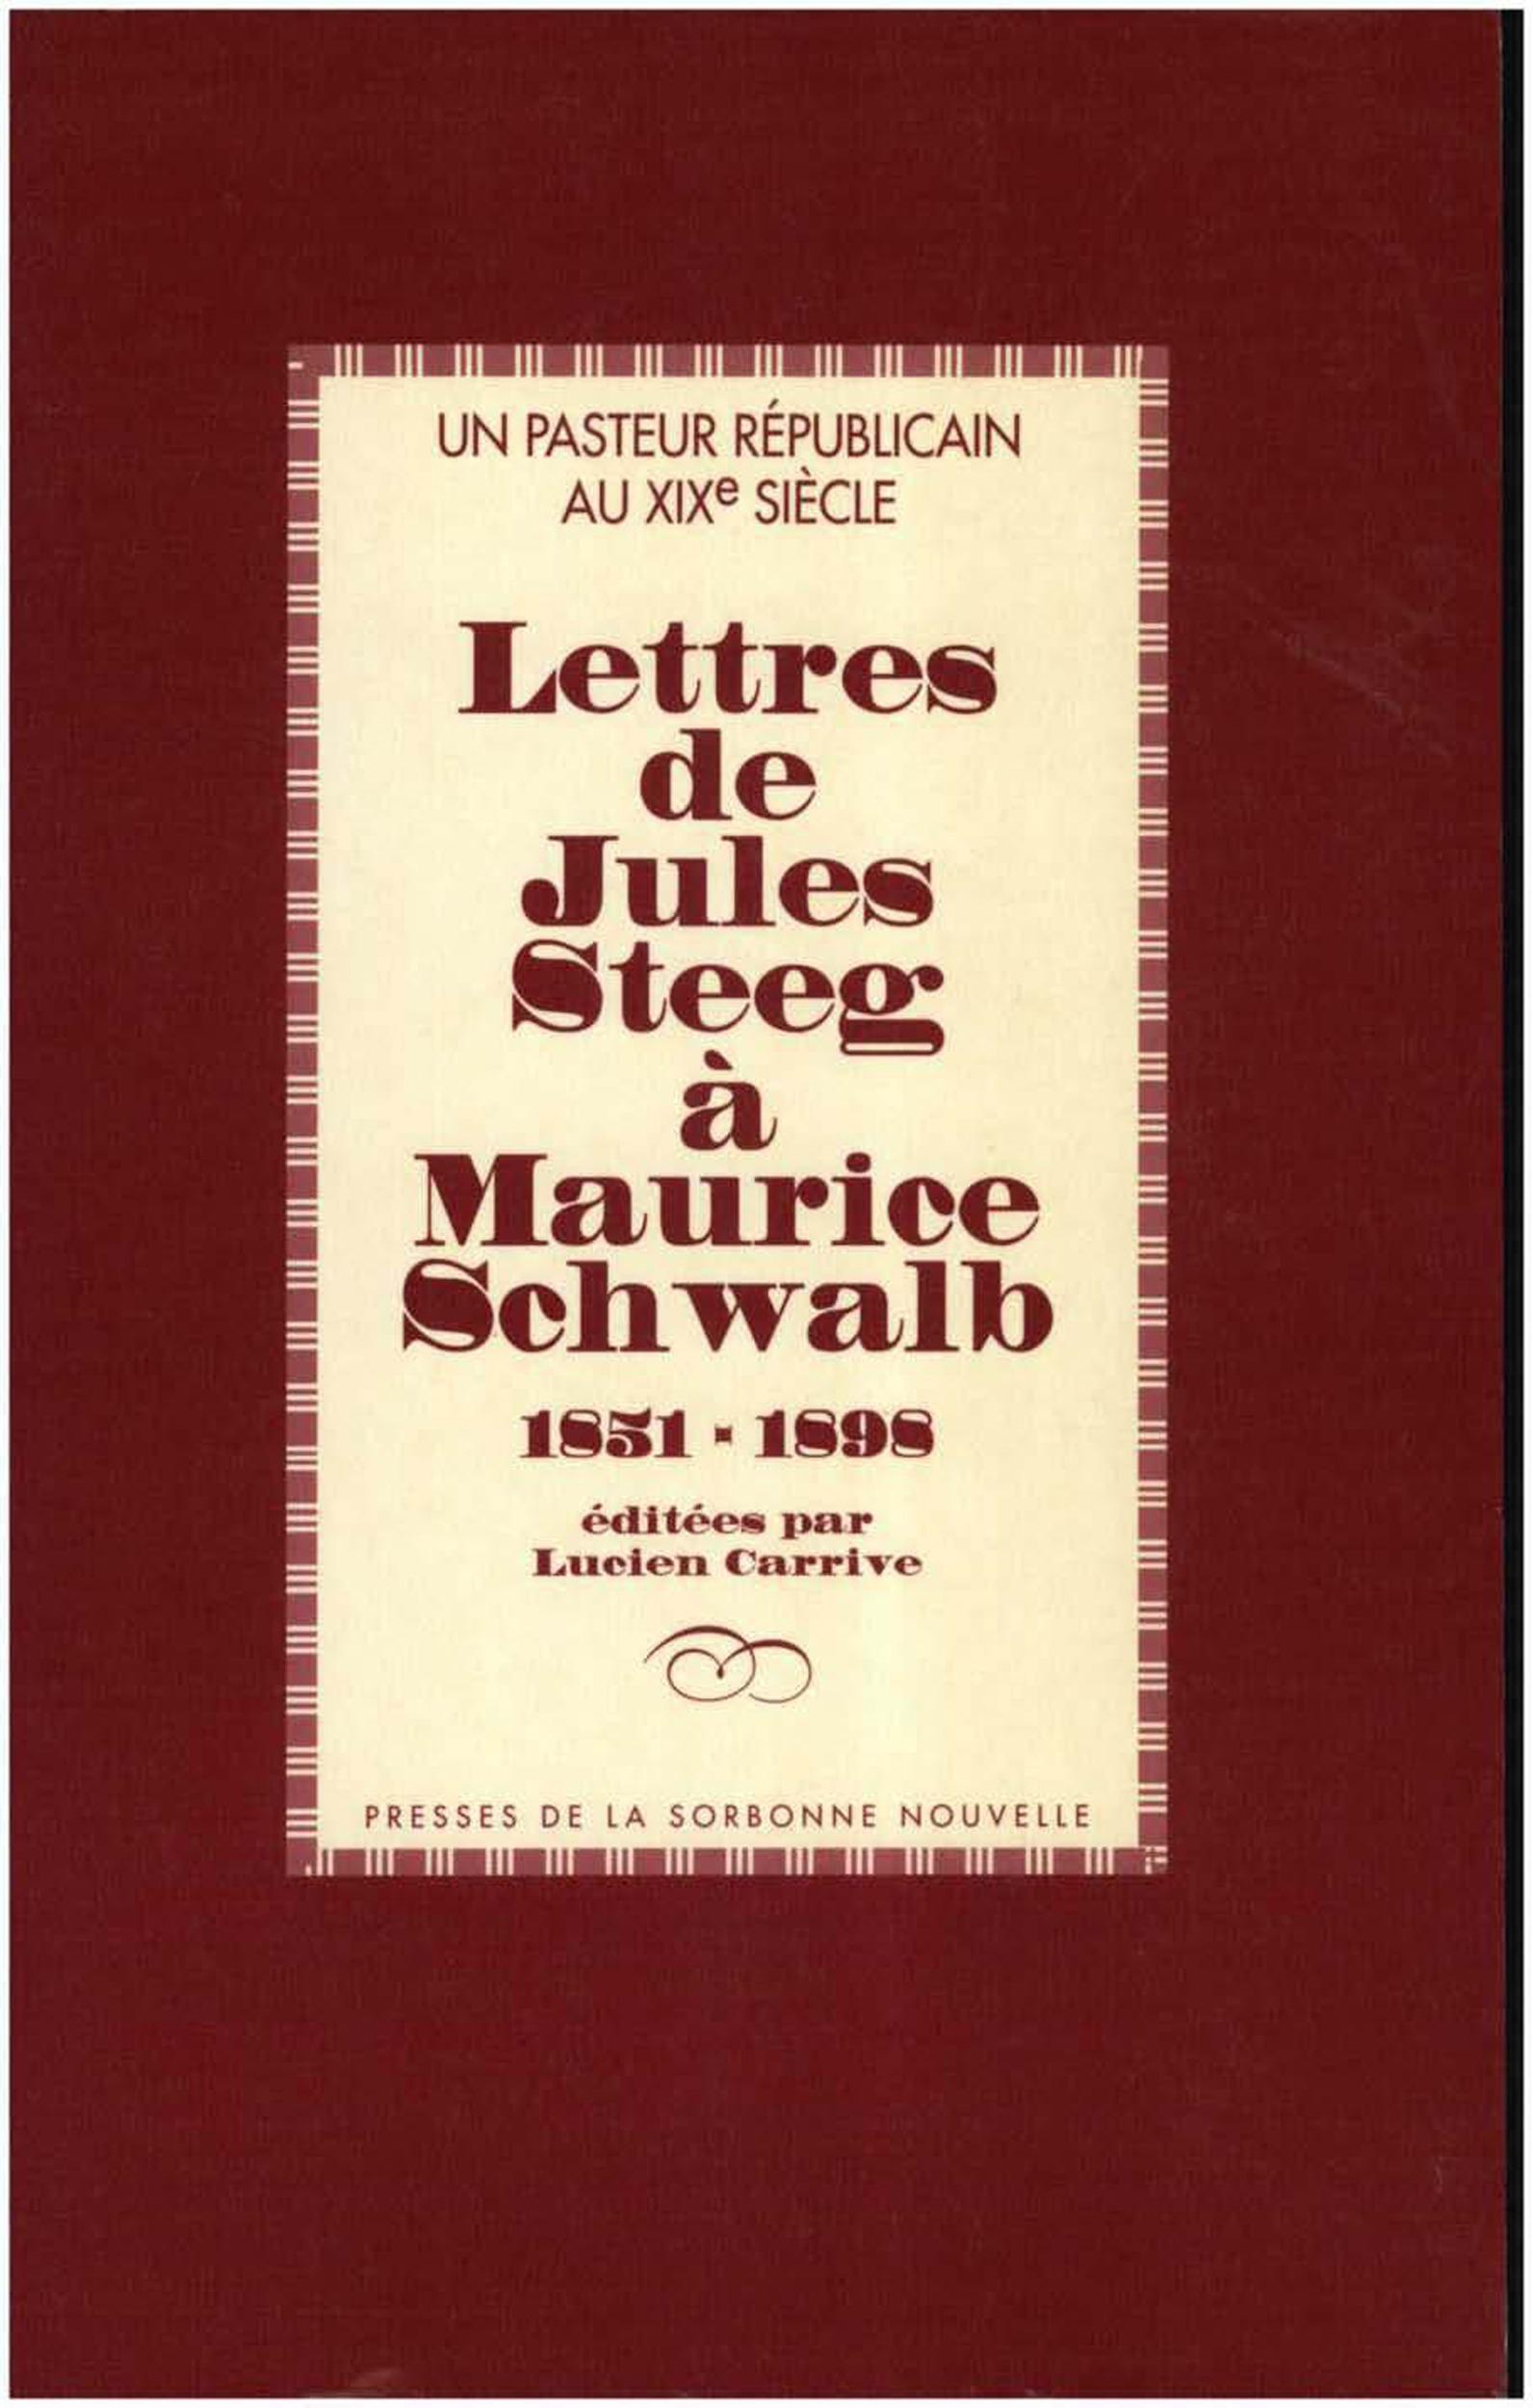 Lettres de jules steeg a maurice schwalb - 1851-1898